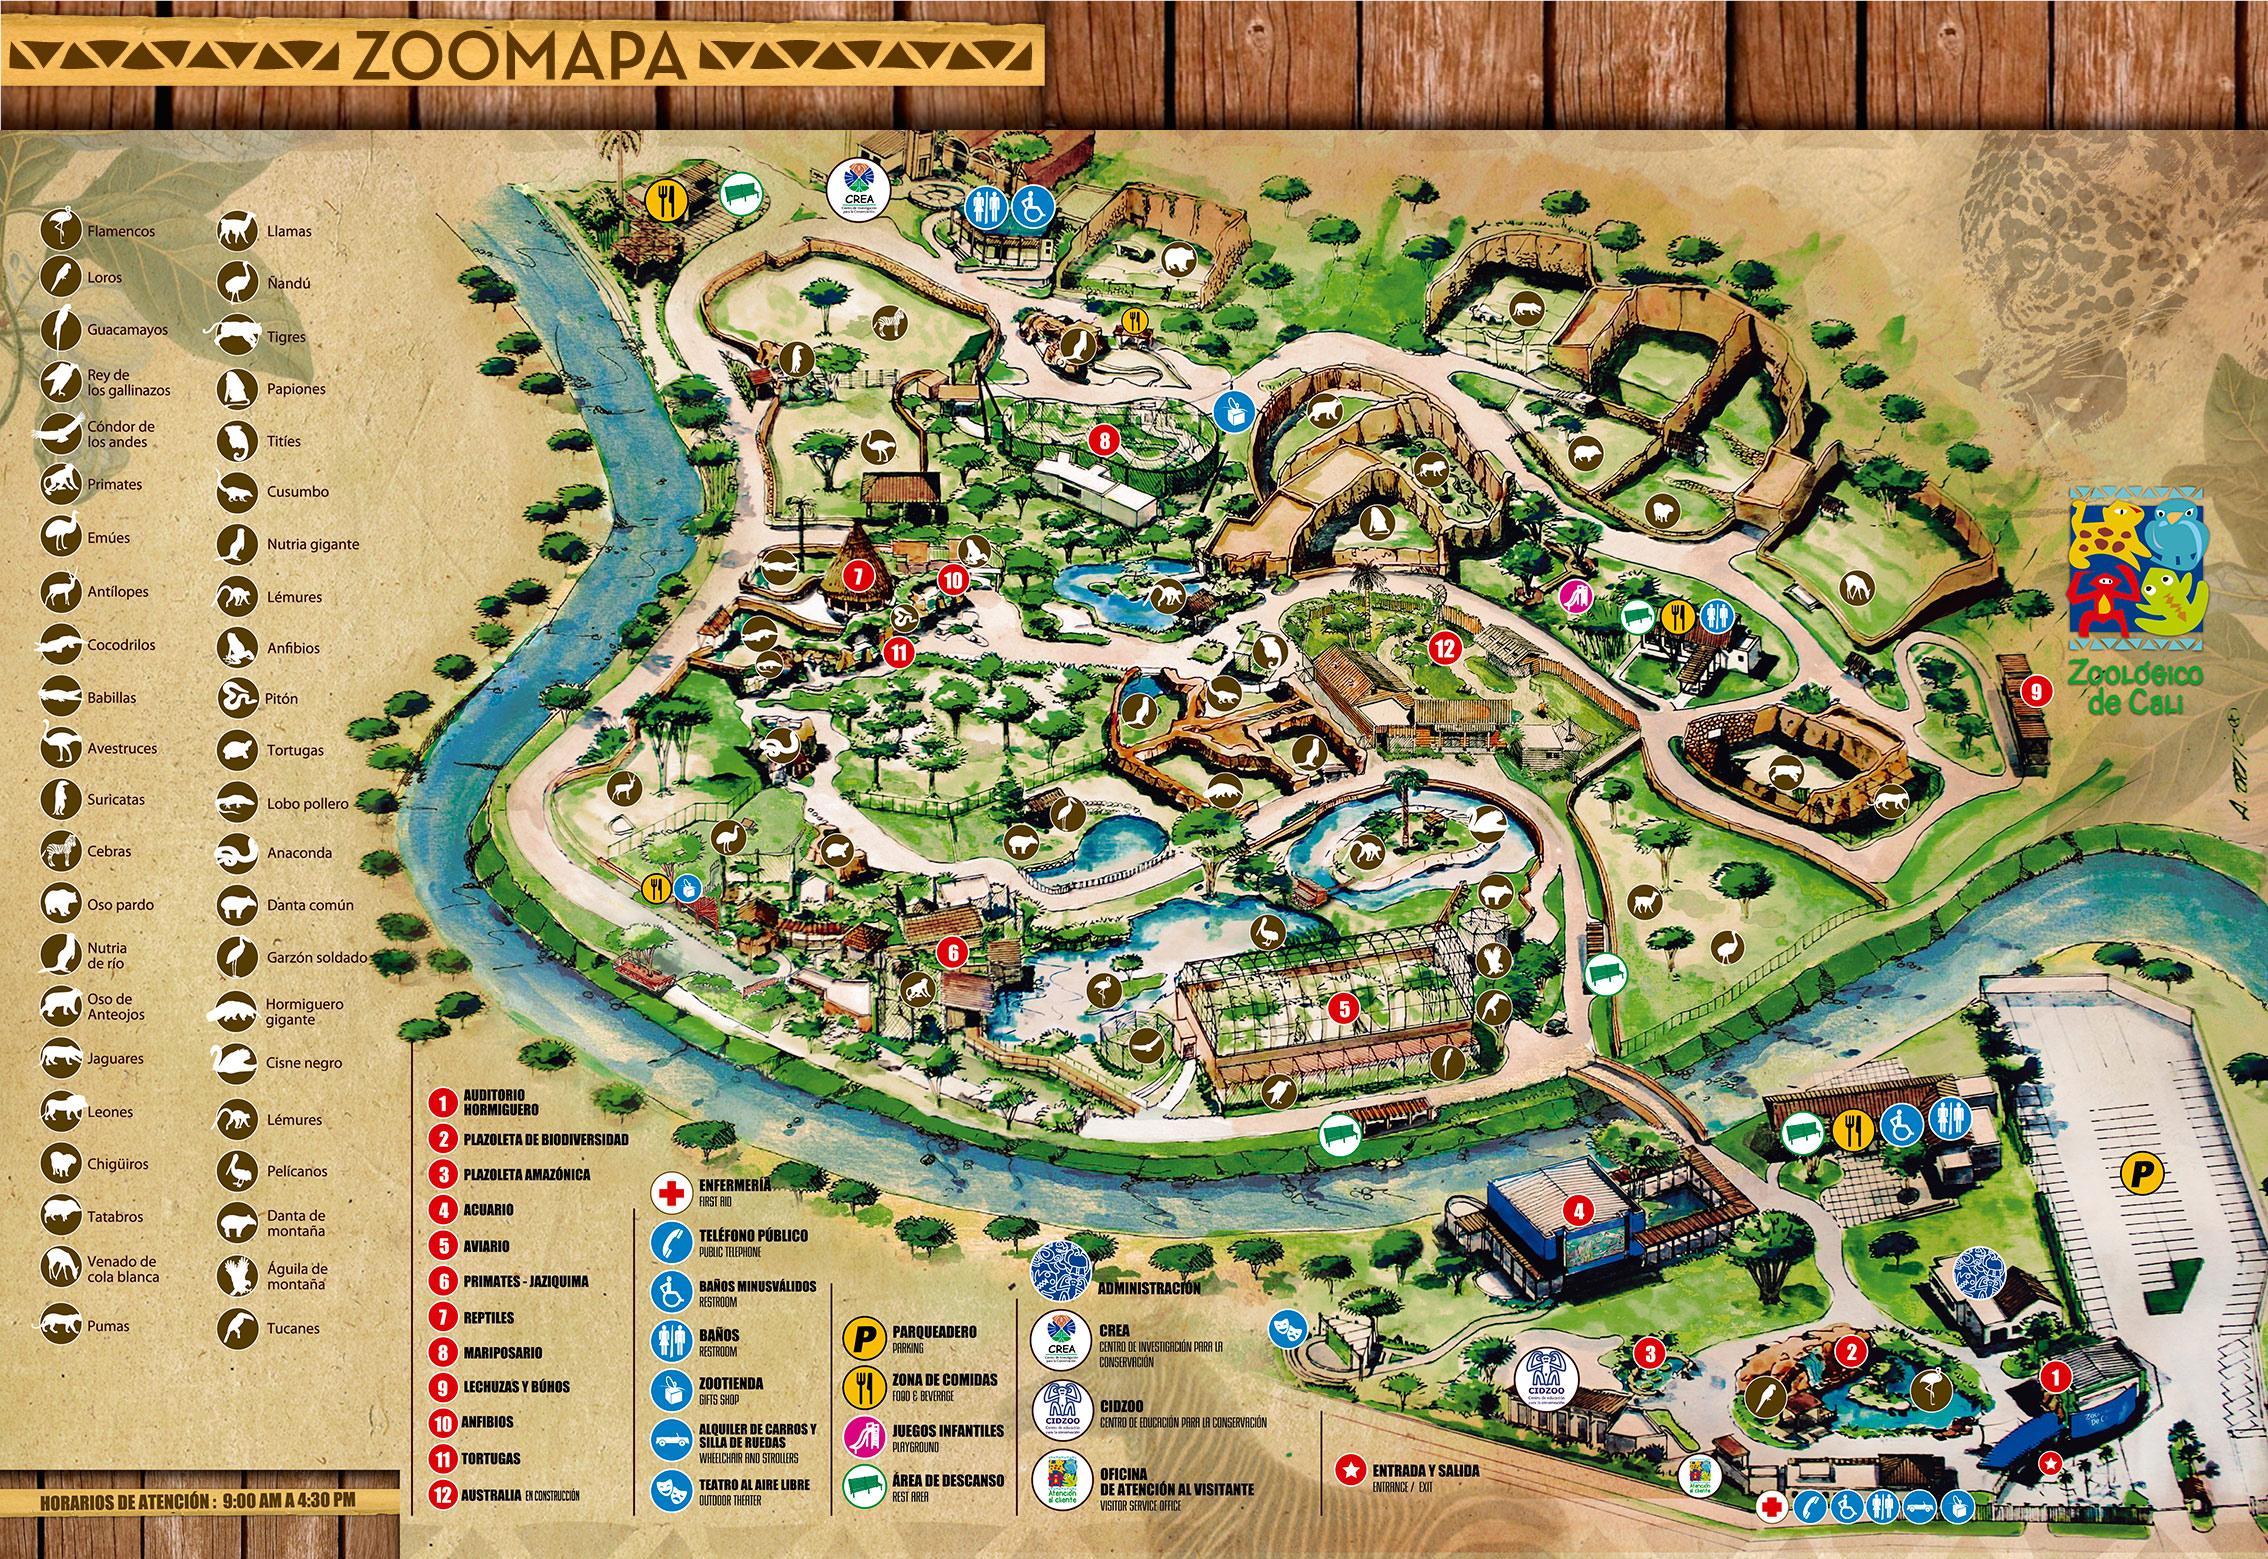 Cali zoo cali zoologico publicscrutiny Image collections